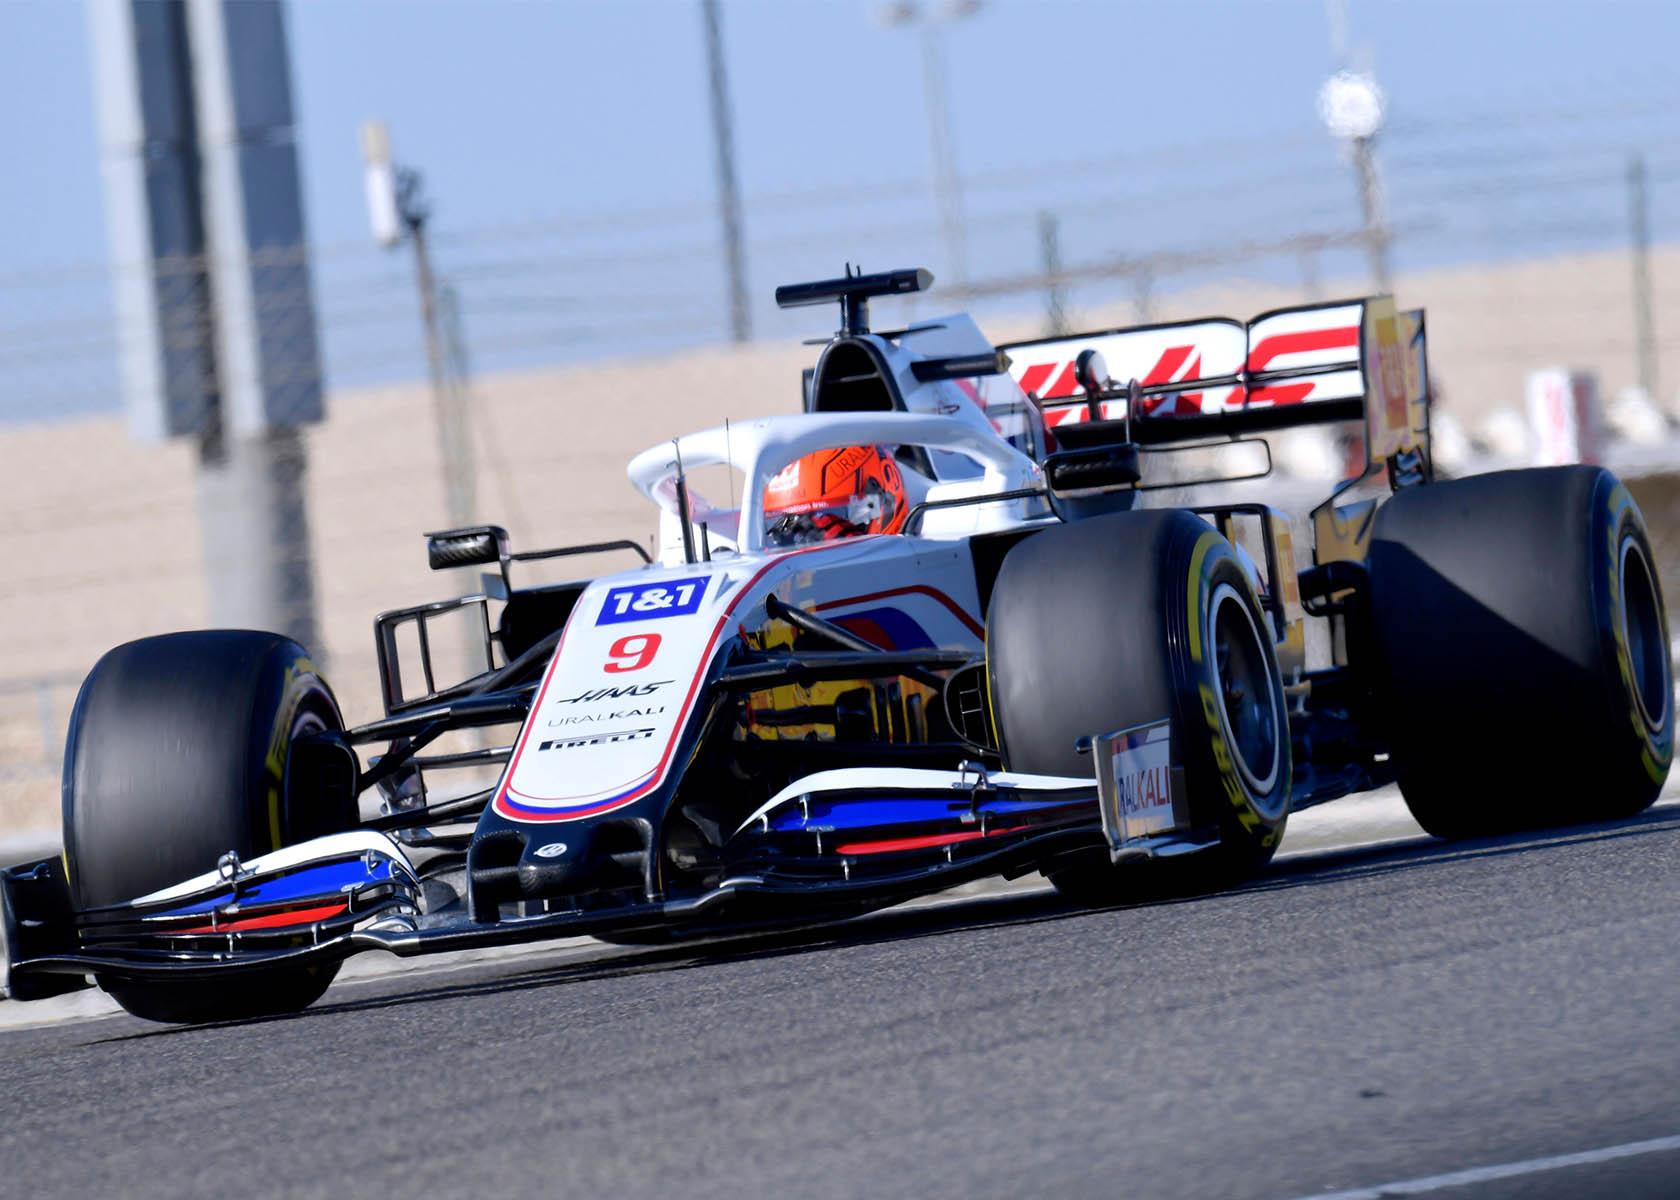 Formel 1 Saisonstart mit Nikita Mazepin